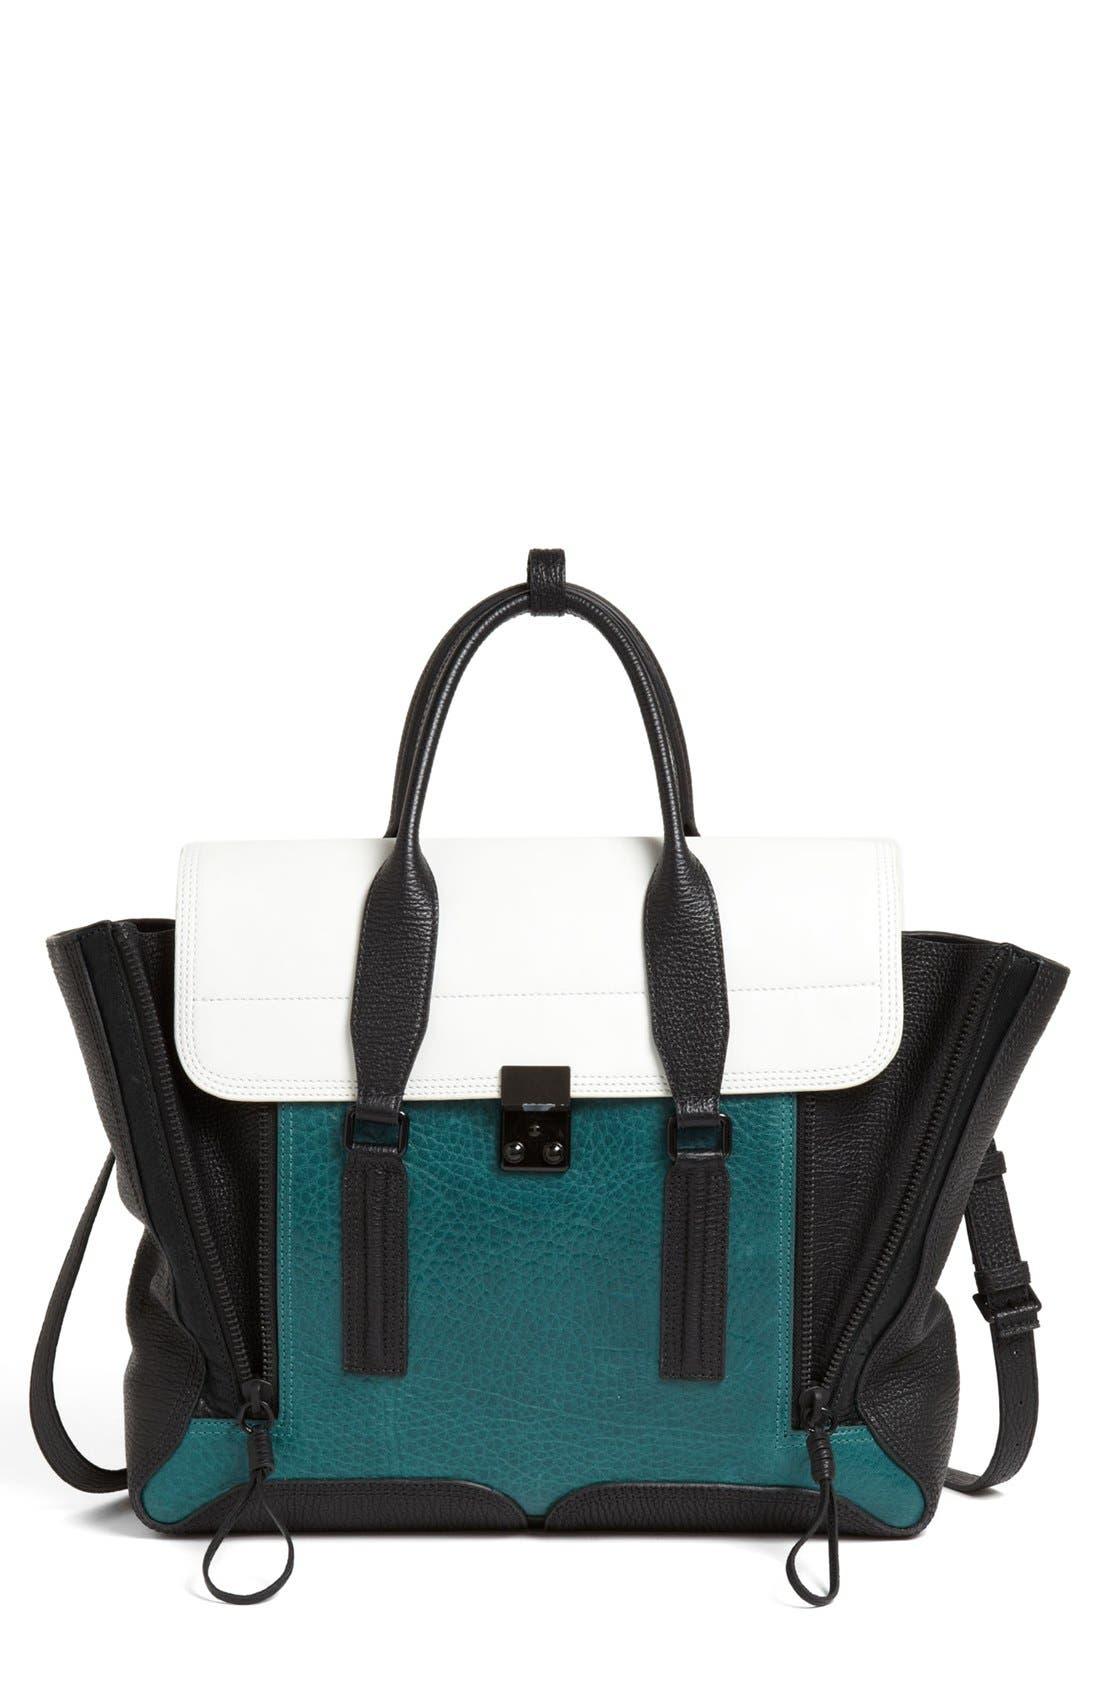 Main Image - 3.1 Phillip Lim 'Pashli' Colorblock Leather Crossbody Satchel (Nordstrom Exclusive)